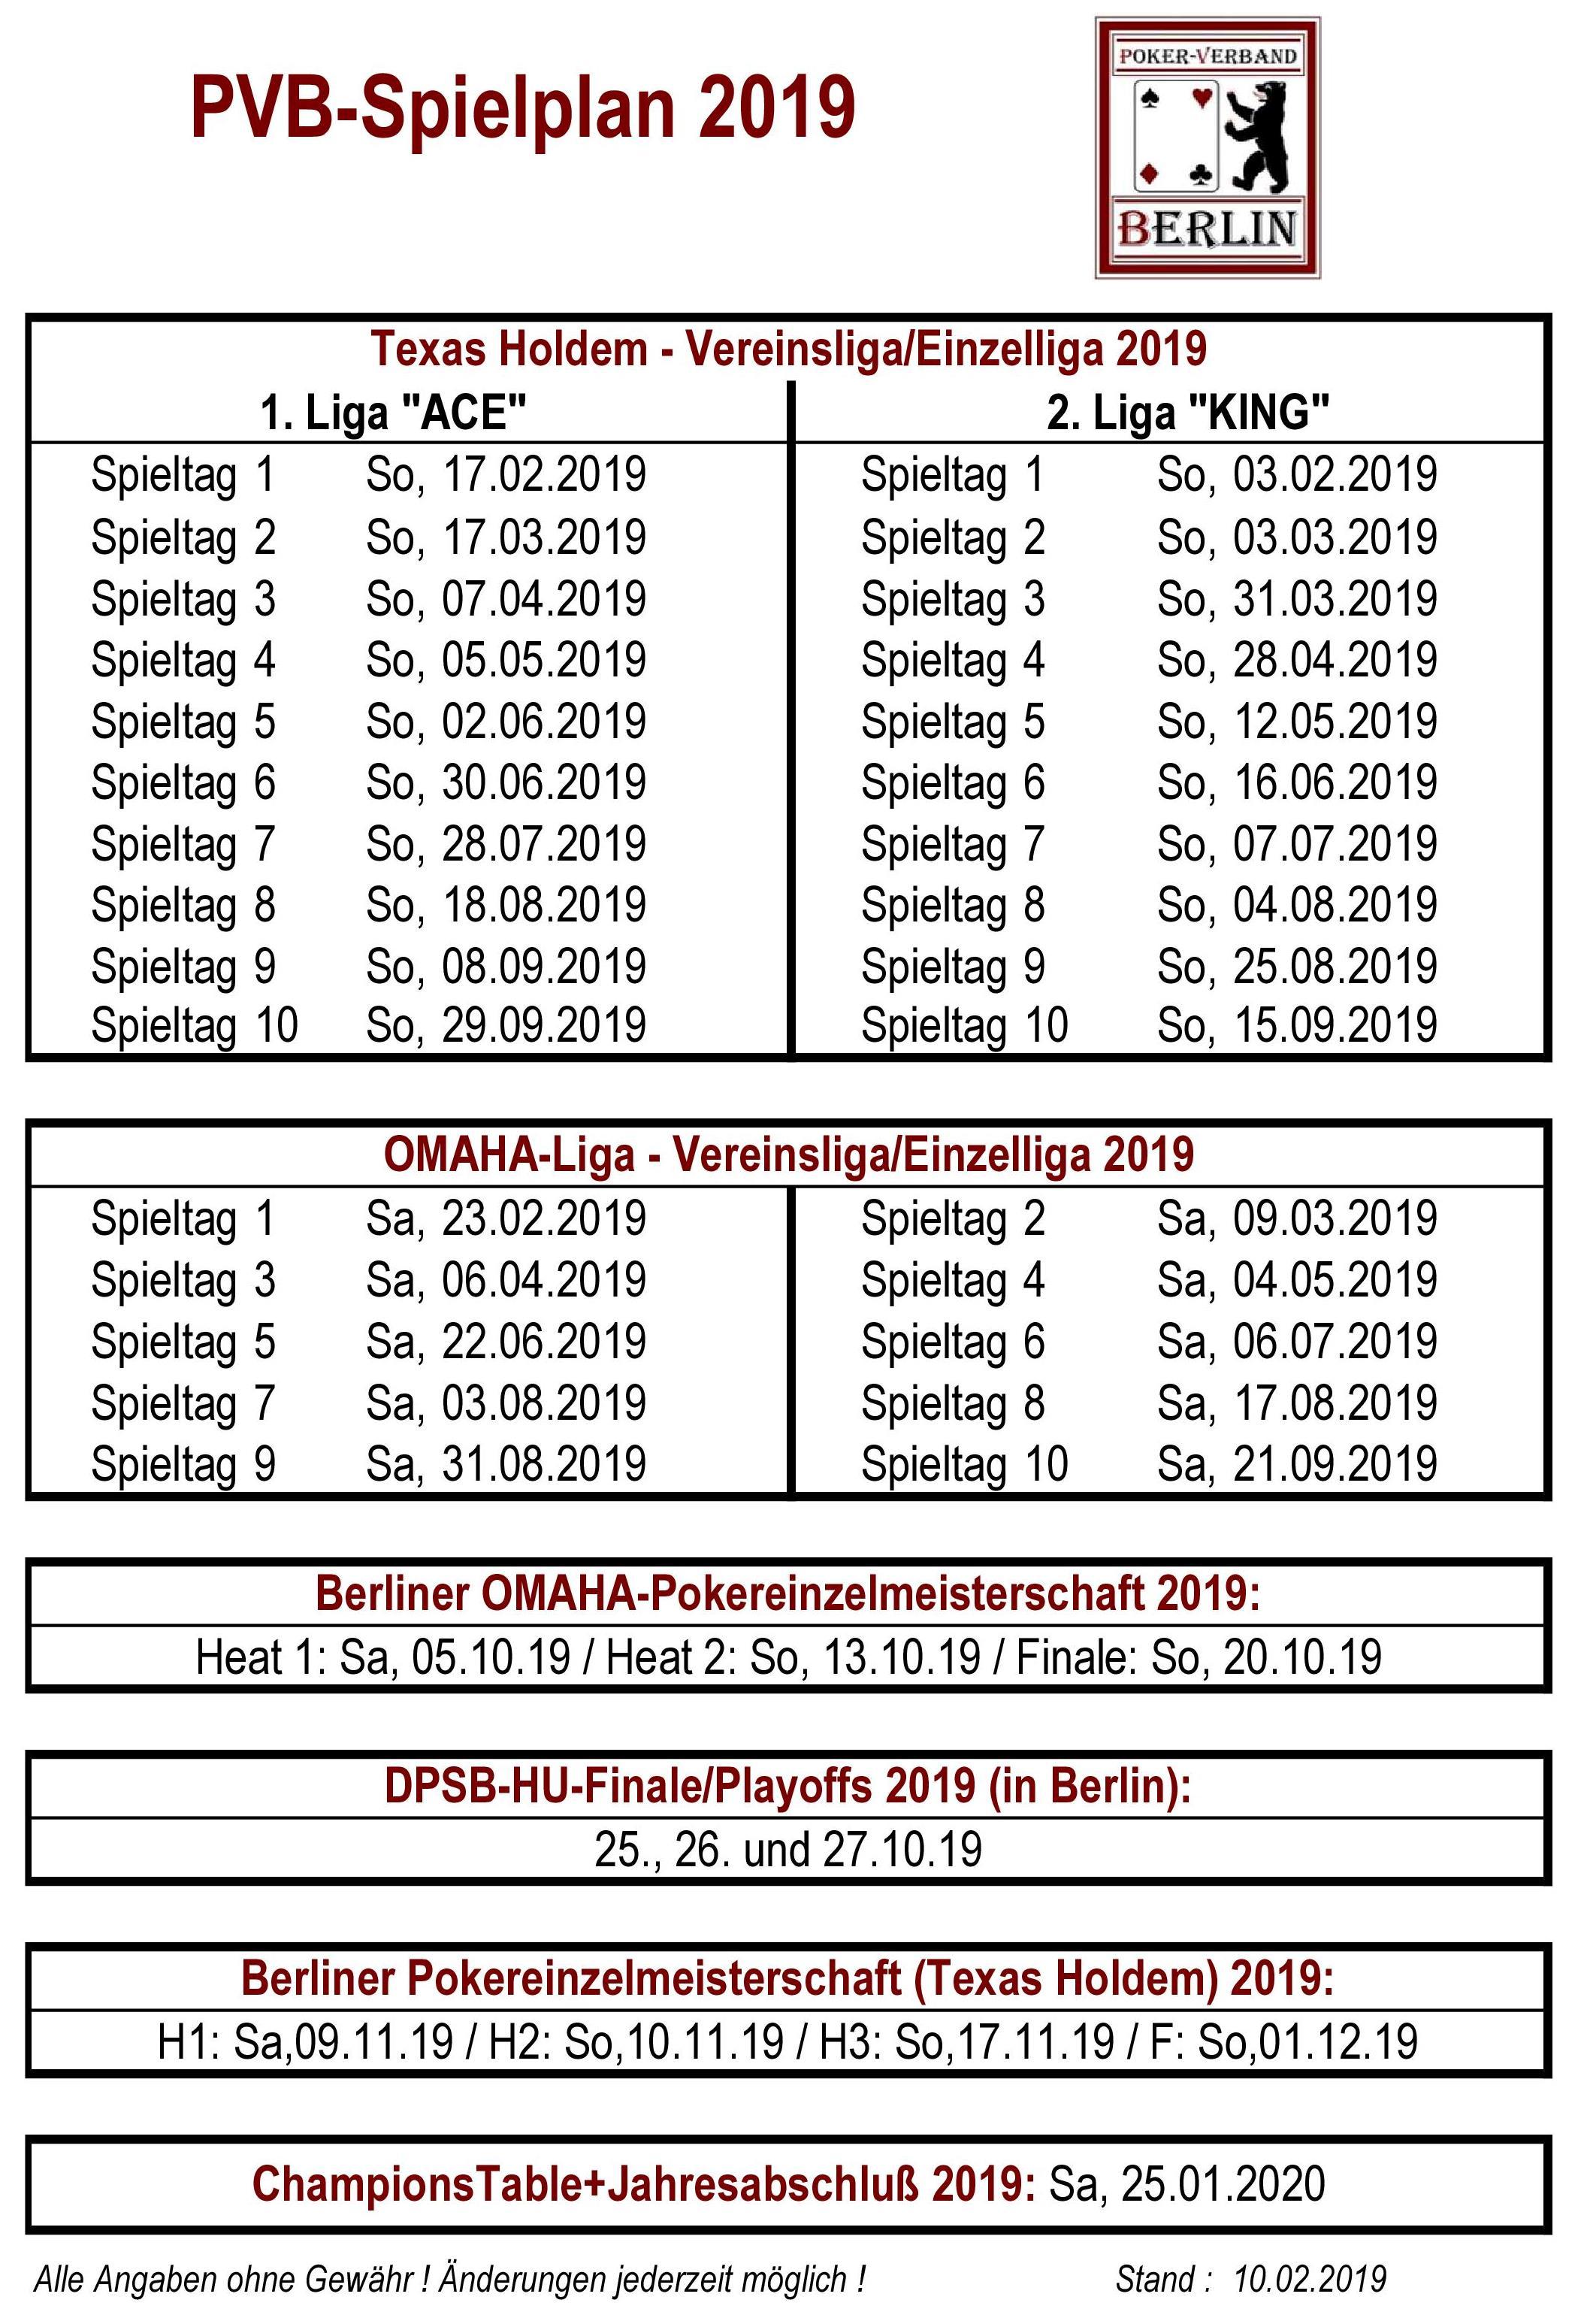 PVB-Spielplan 2019